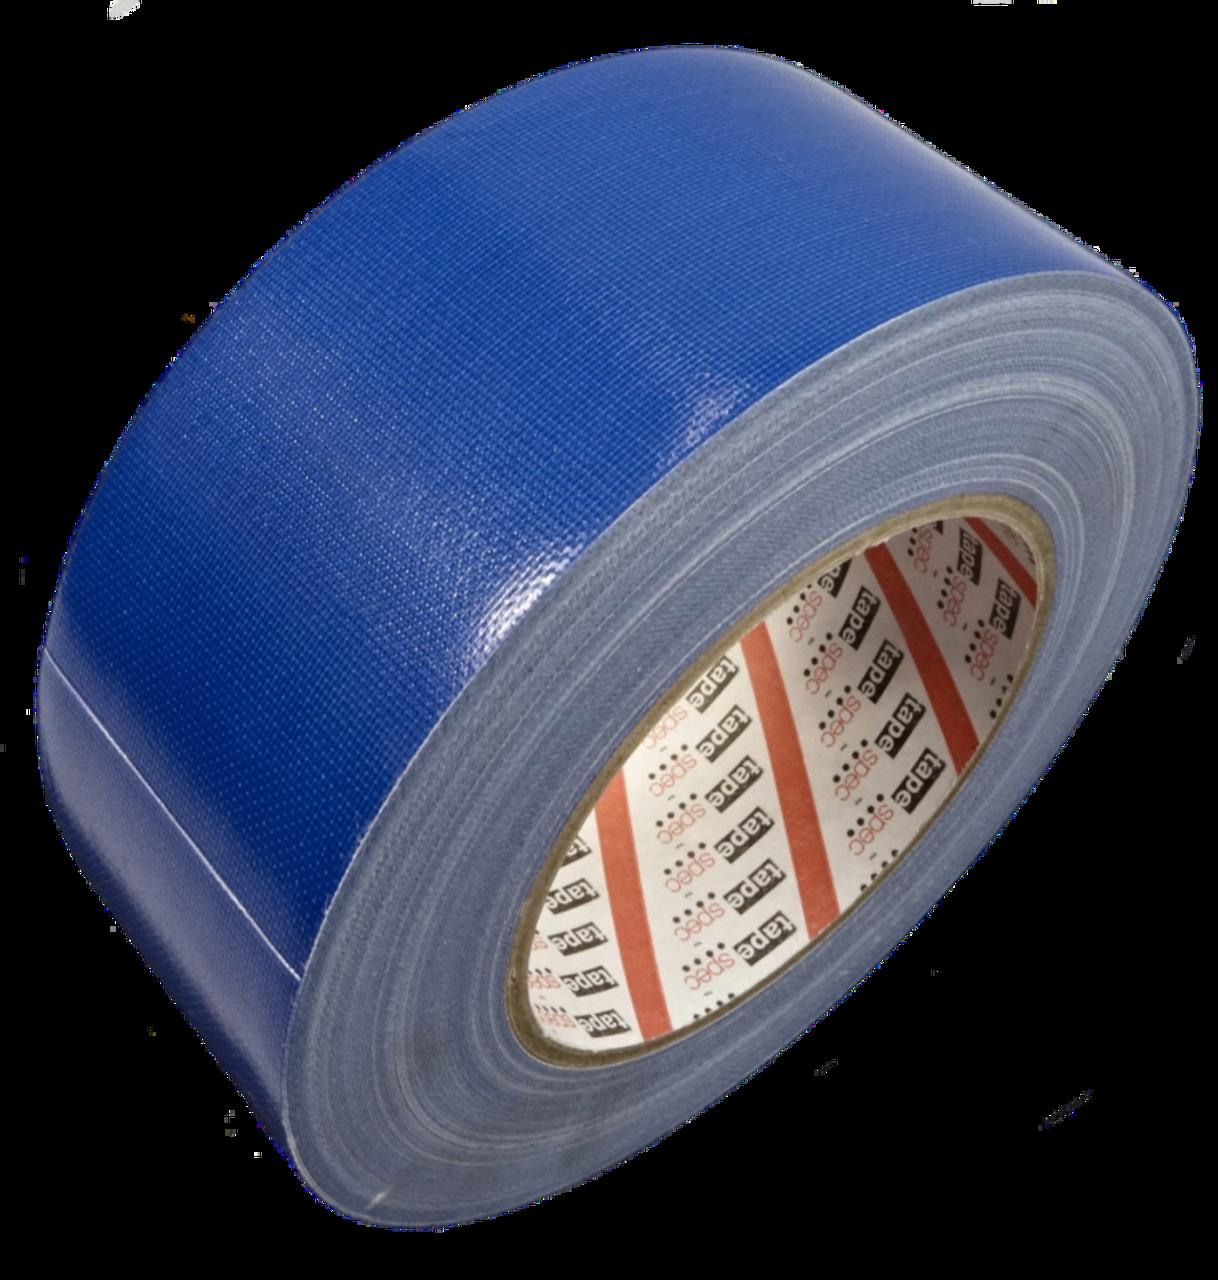 CLOTH BOOK BINDING TAPE 48MM X 30M (BLUE)